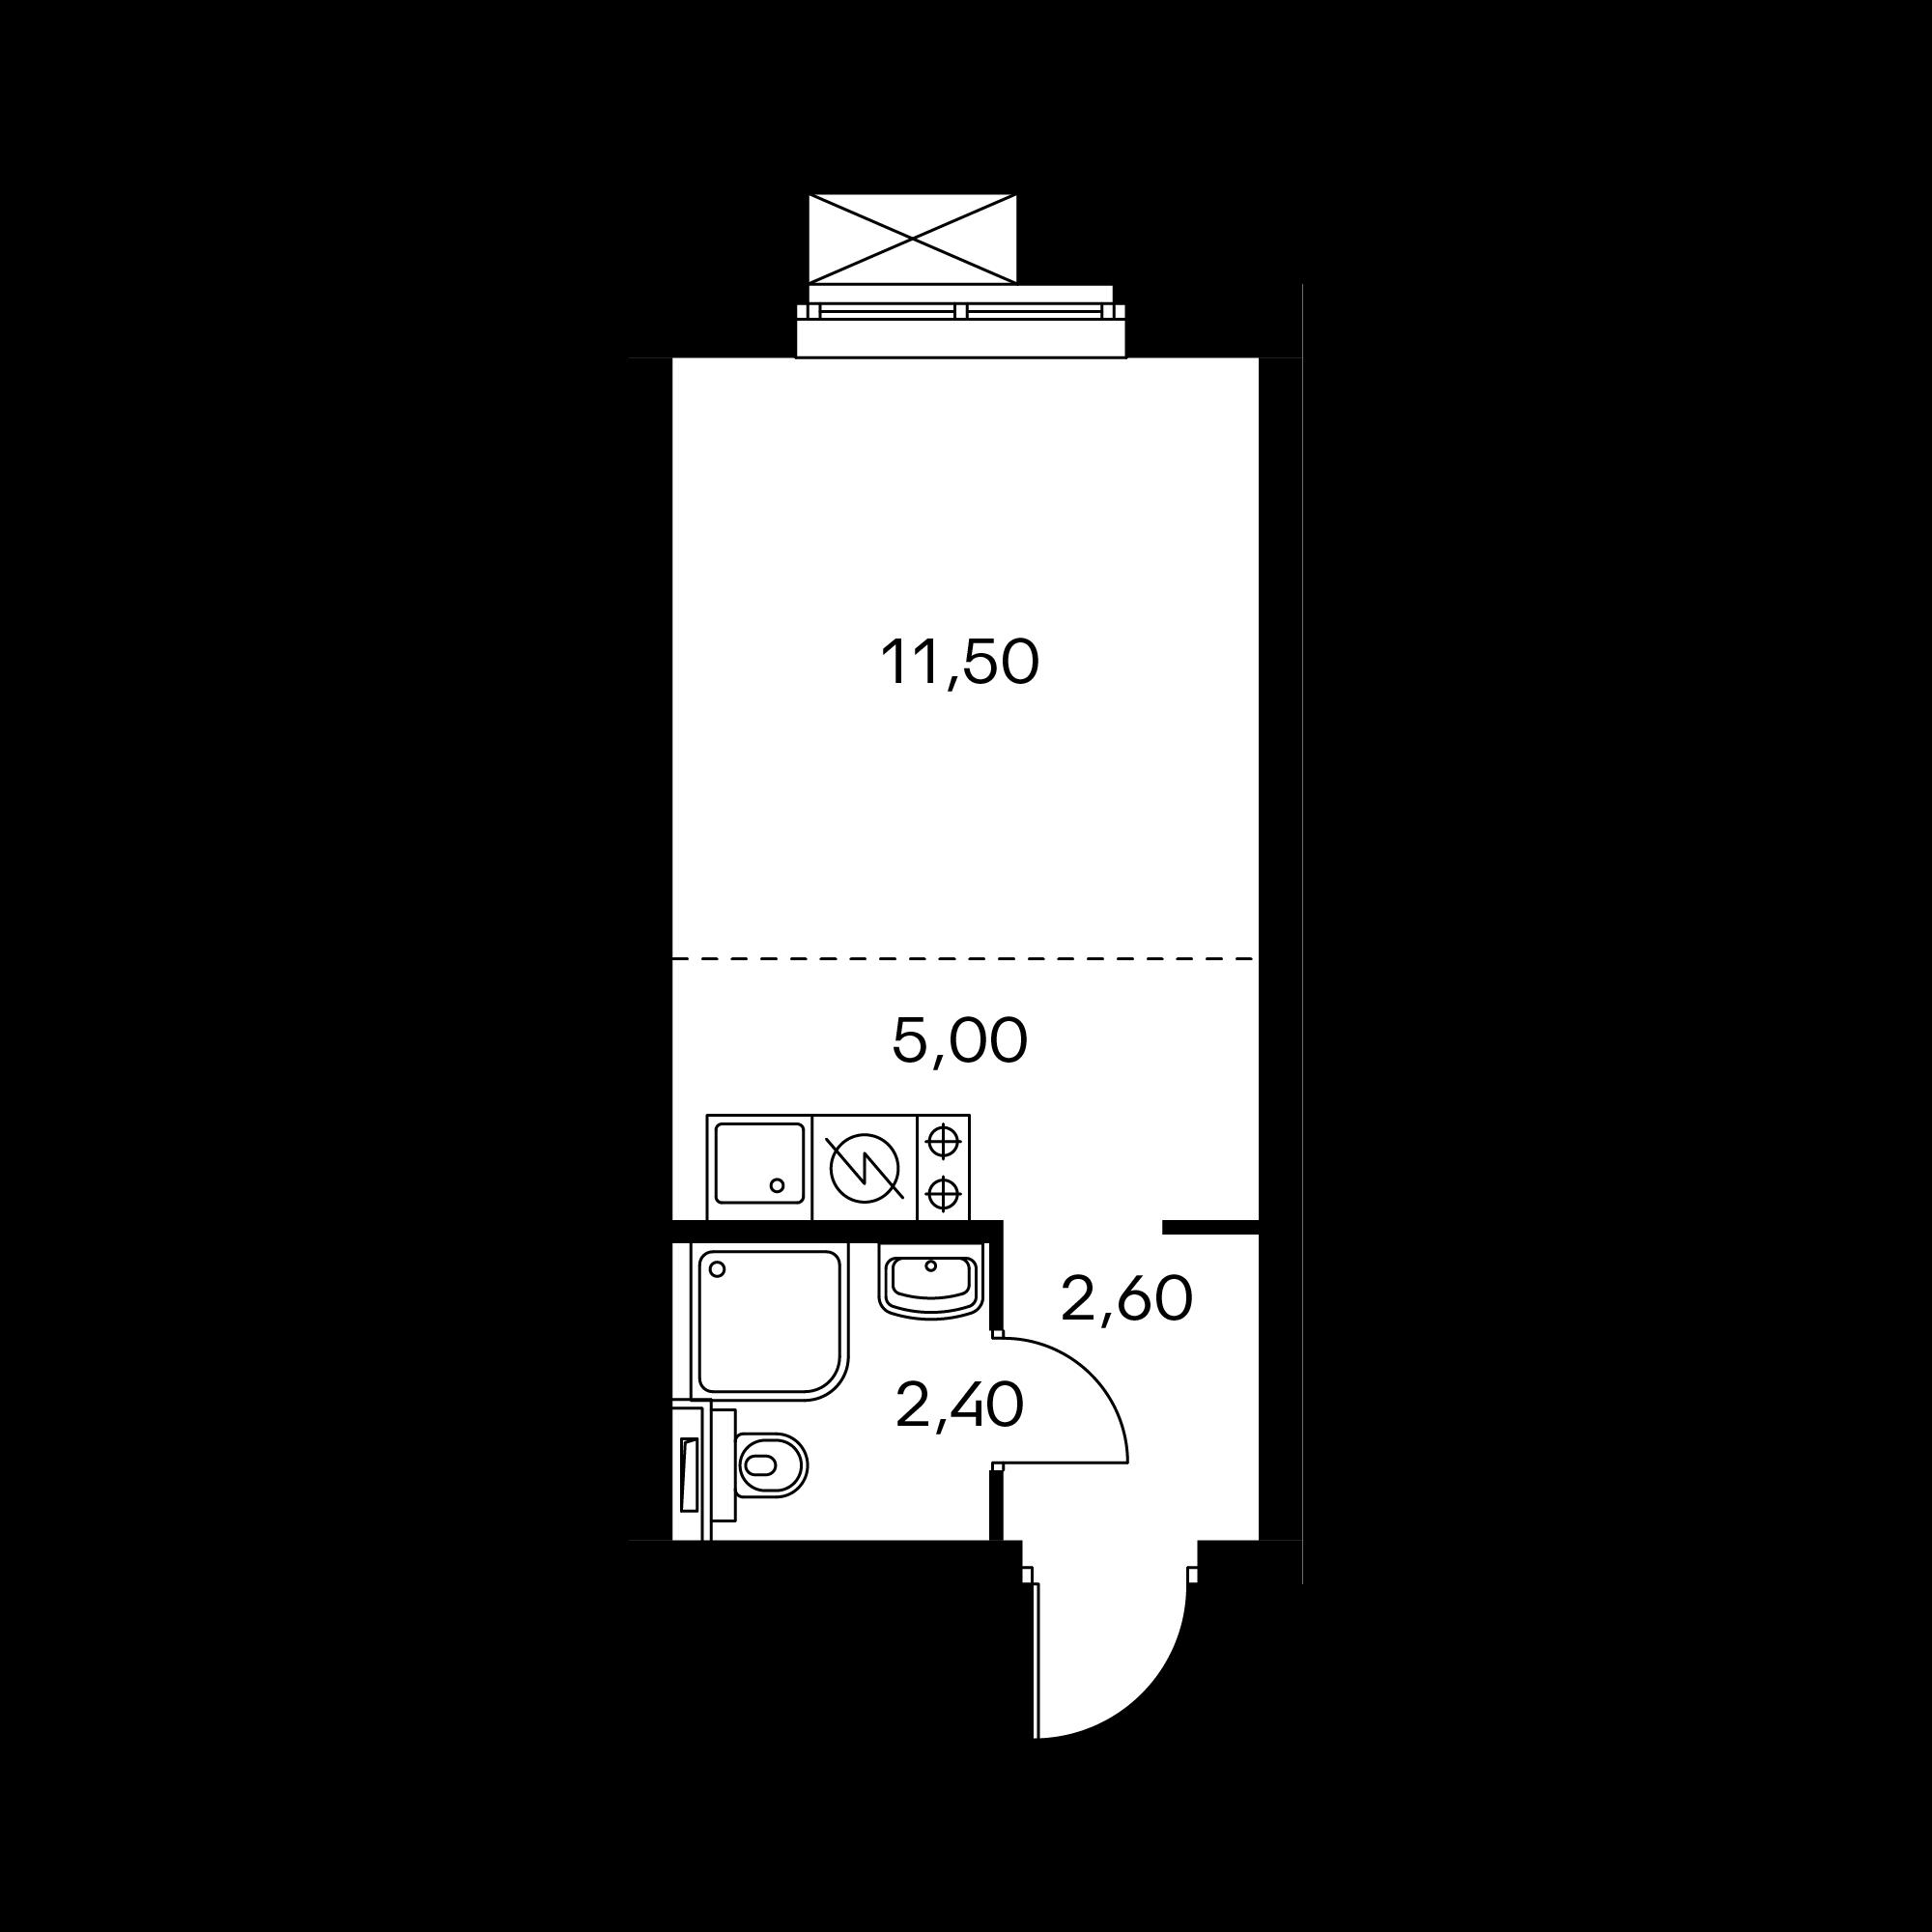 1NS1_3.6